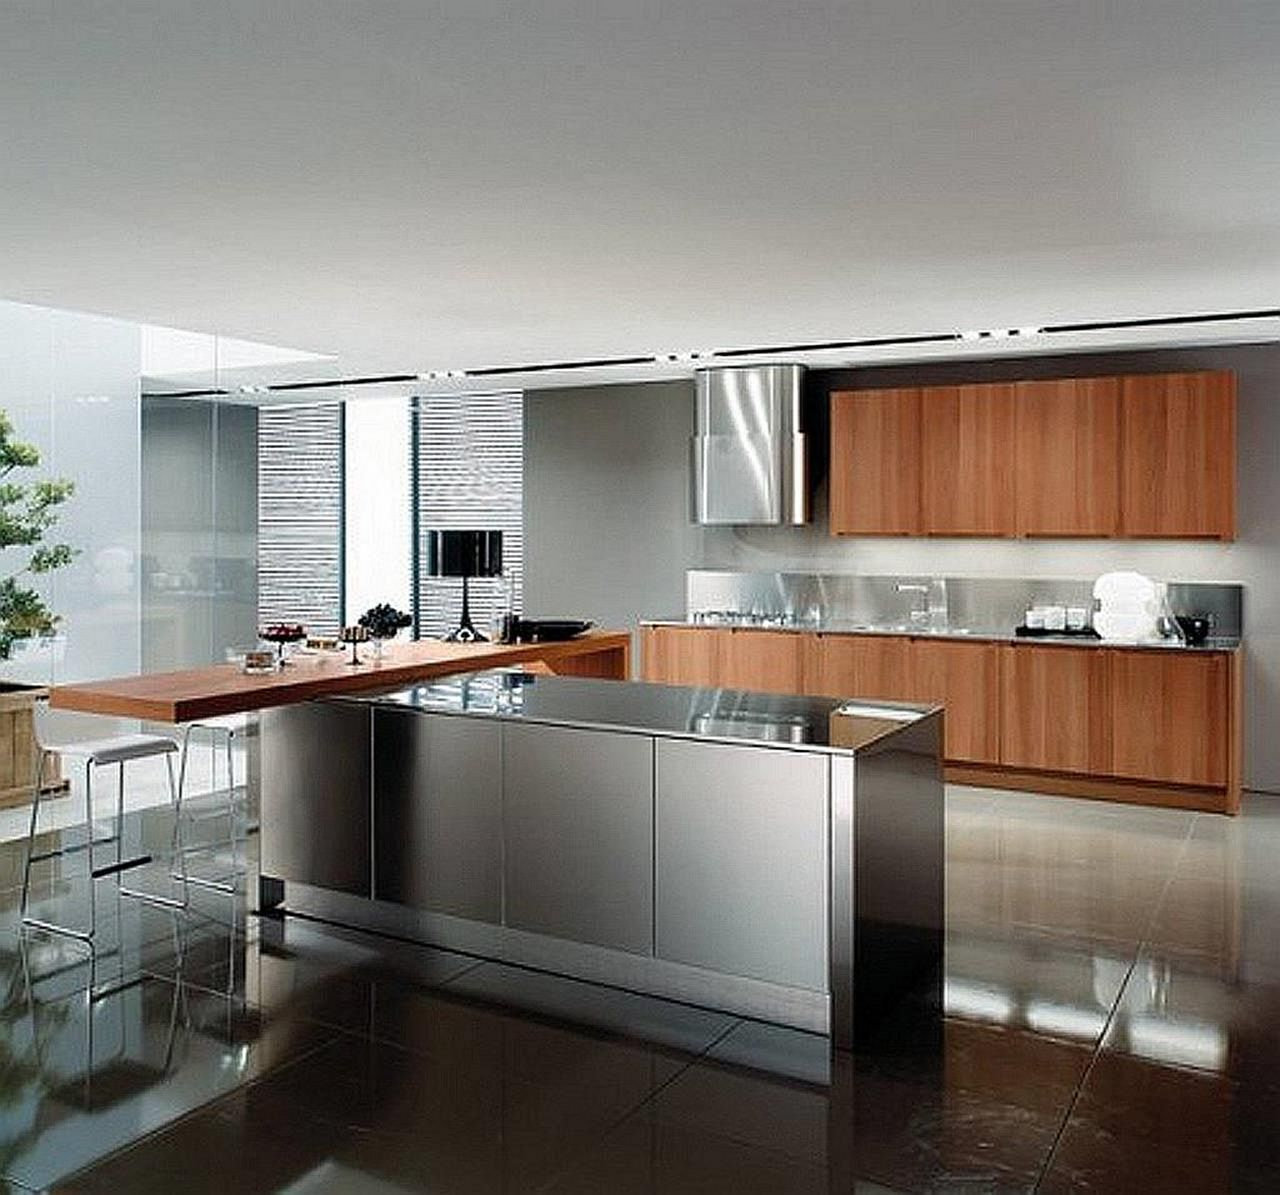 Minimalist Kitchen Island Ideas In 2020 With Images Kitchen